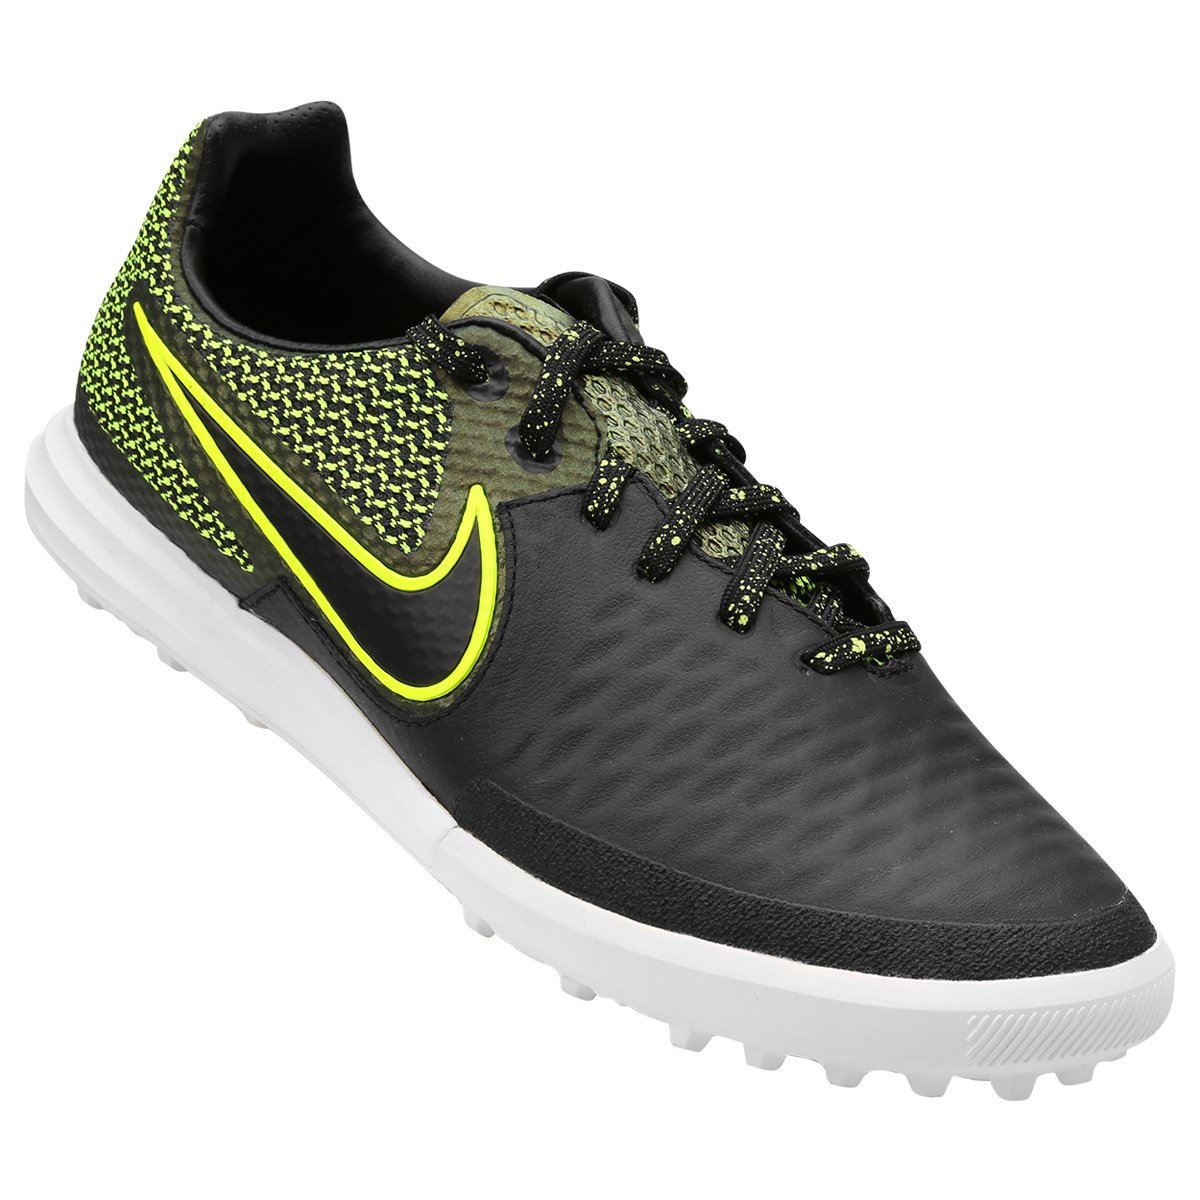 efb530d253 Chuteira Nike Magista X Finale TF Society - Compre Agora